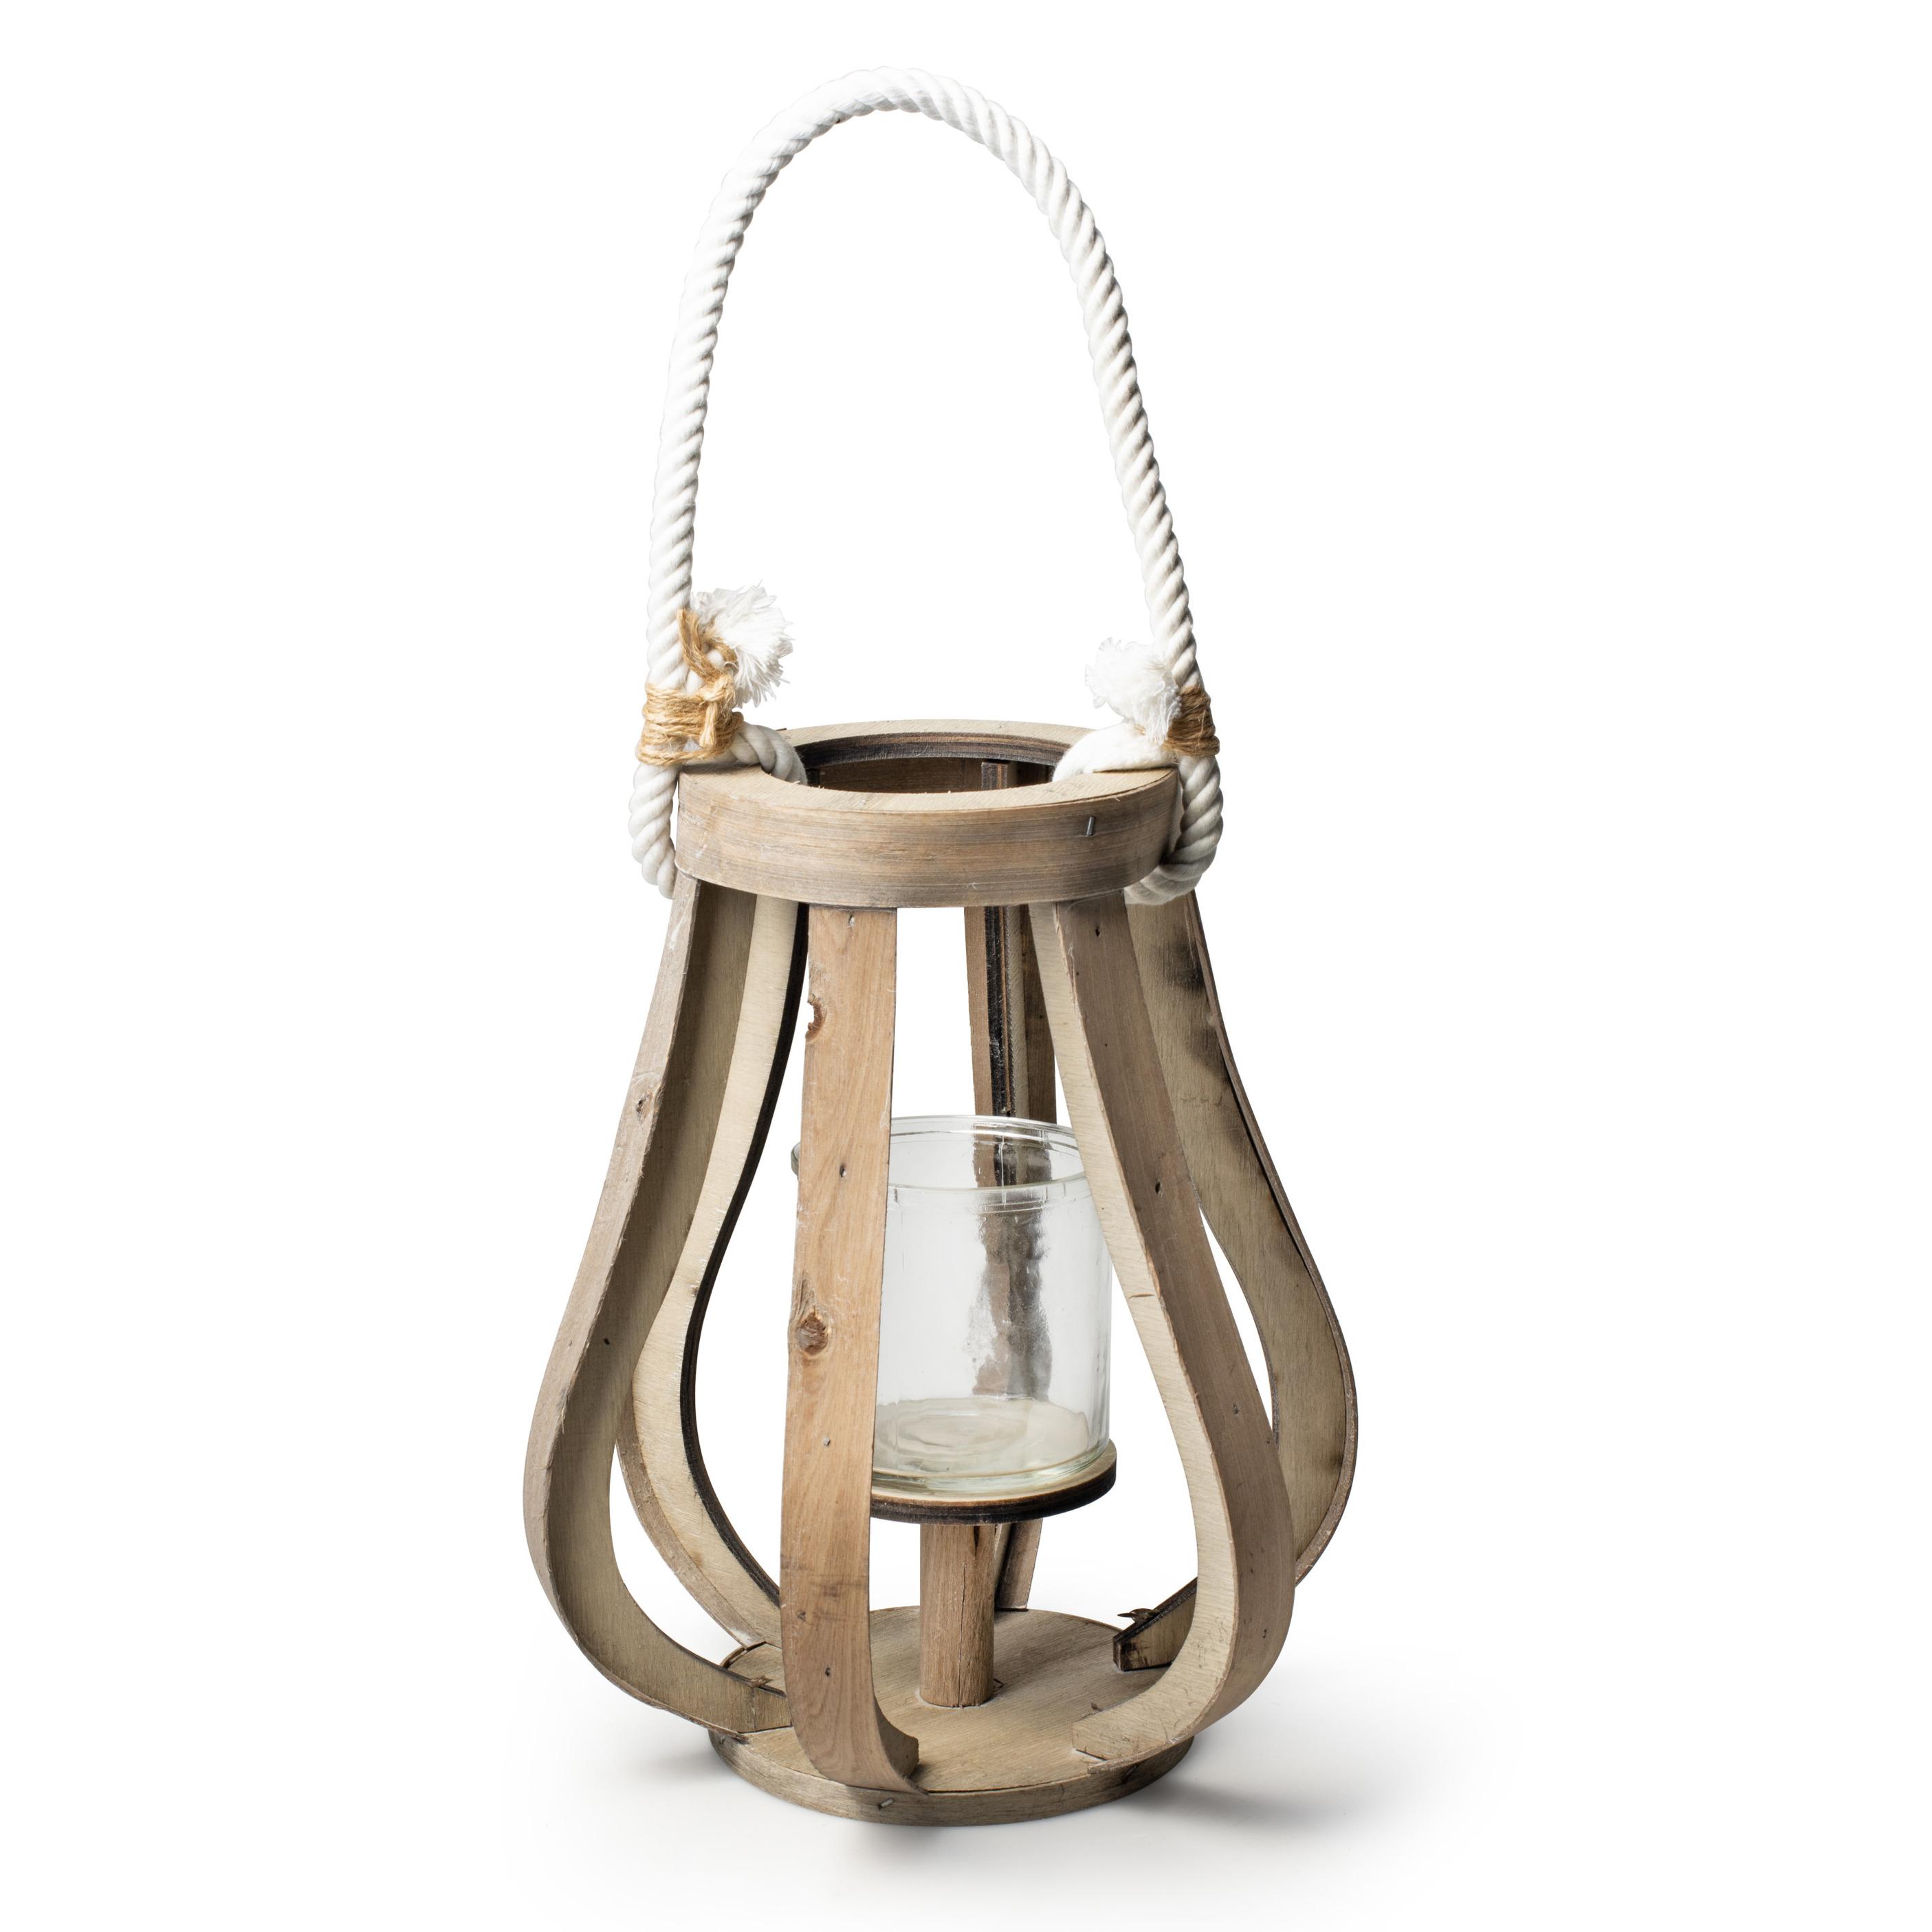 Houten windlicht kaarsenhouder lantaarn 25 cm